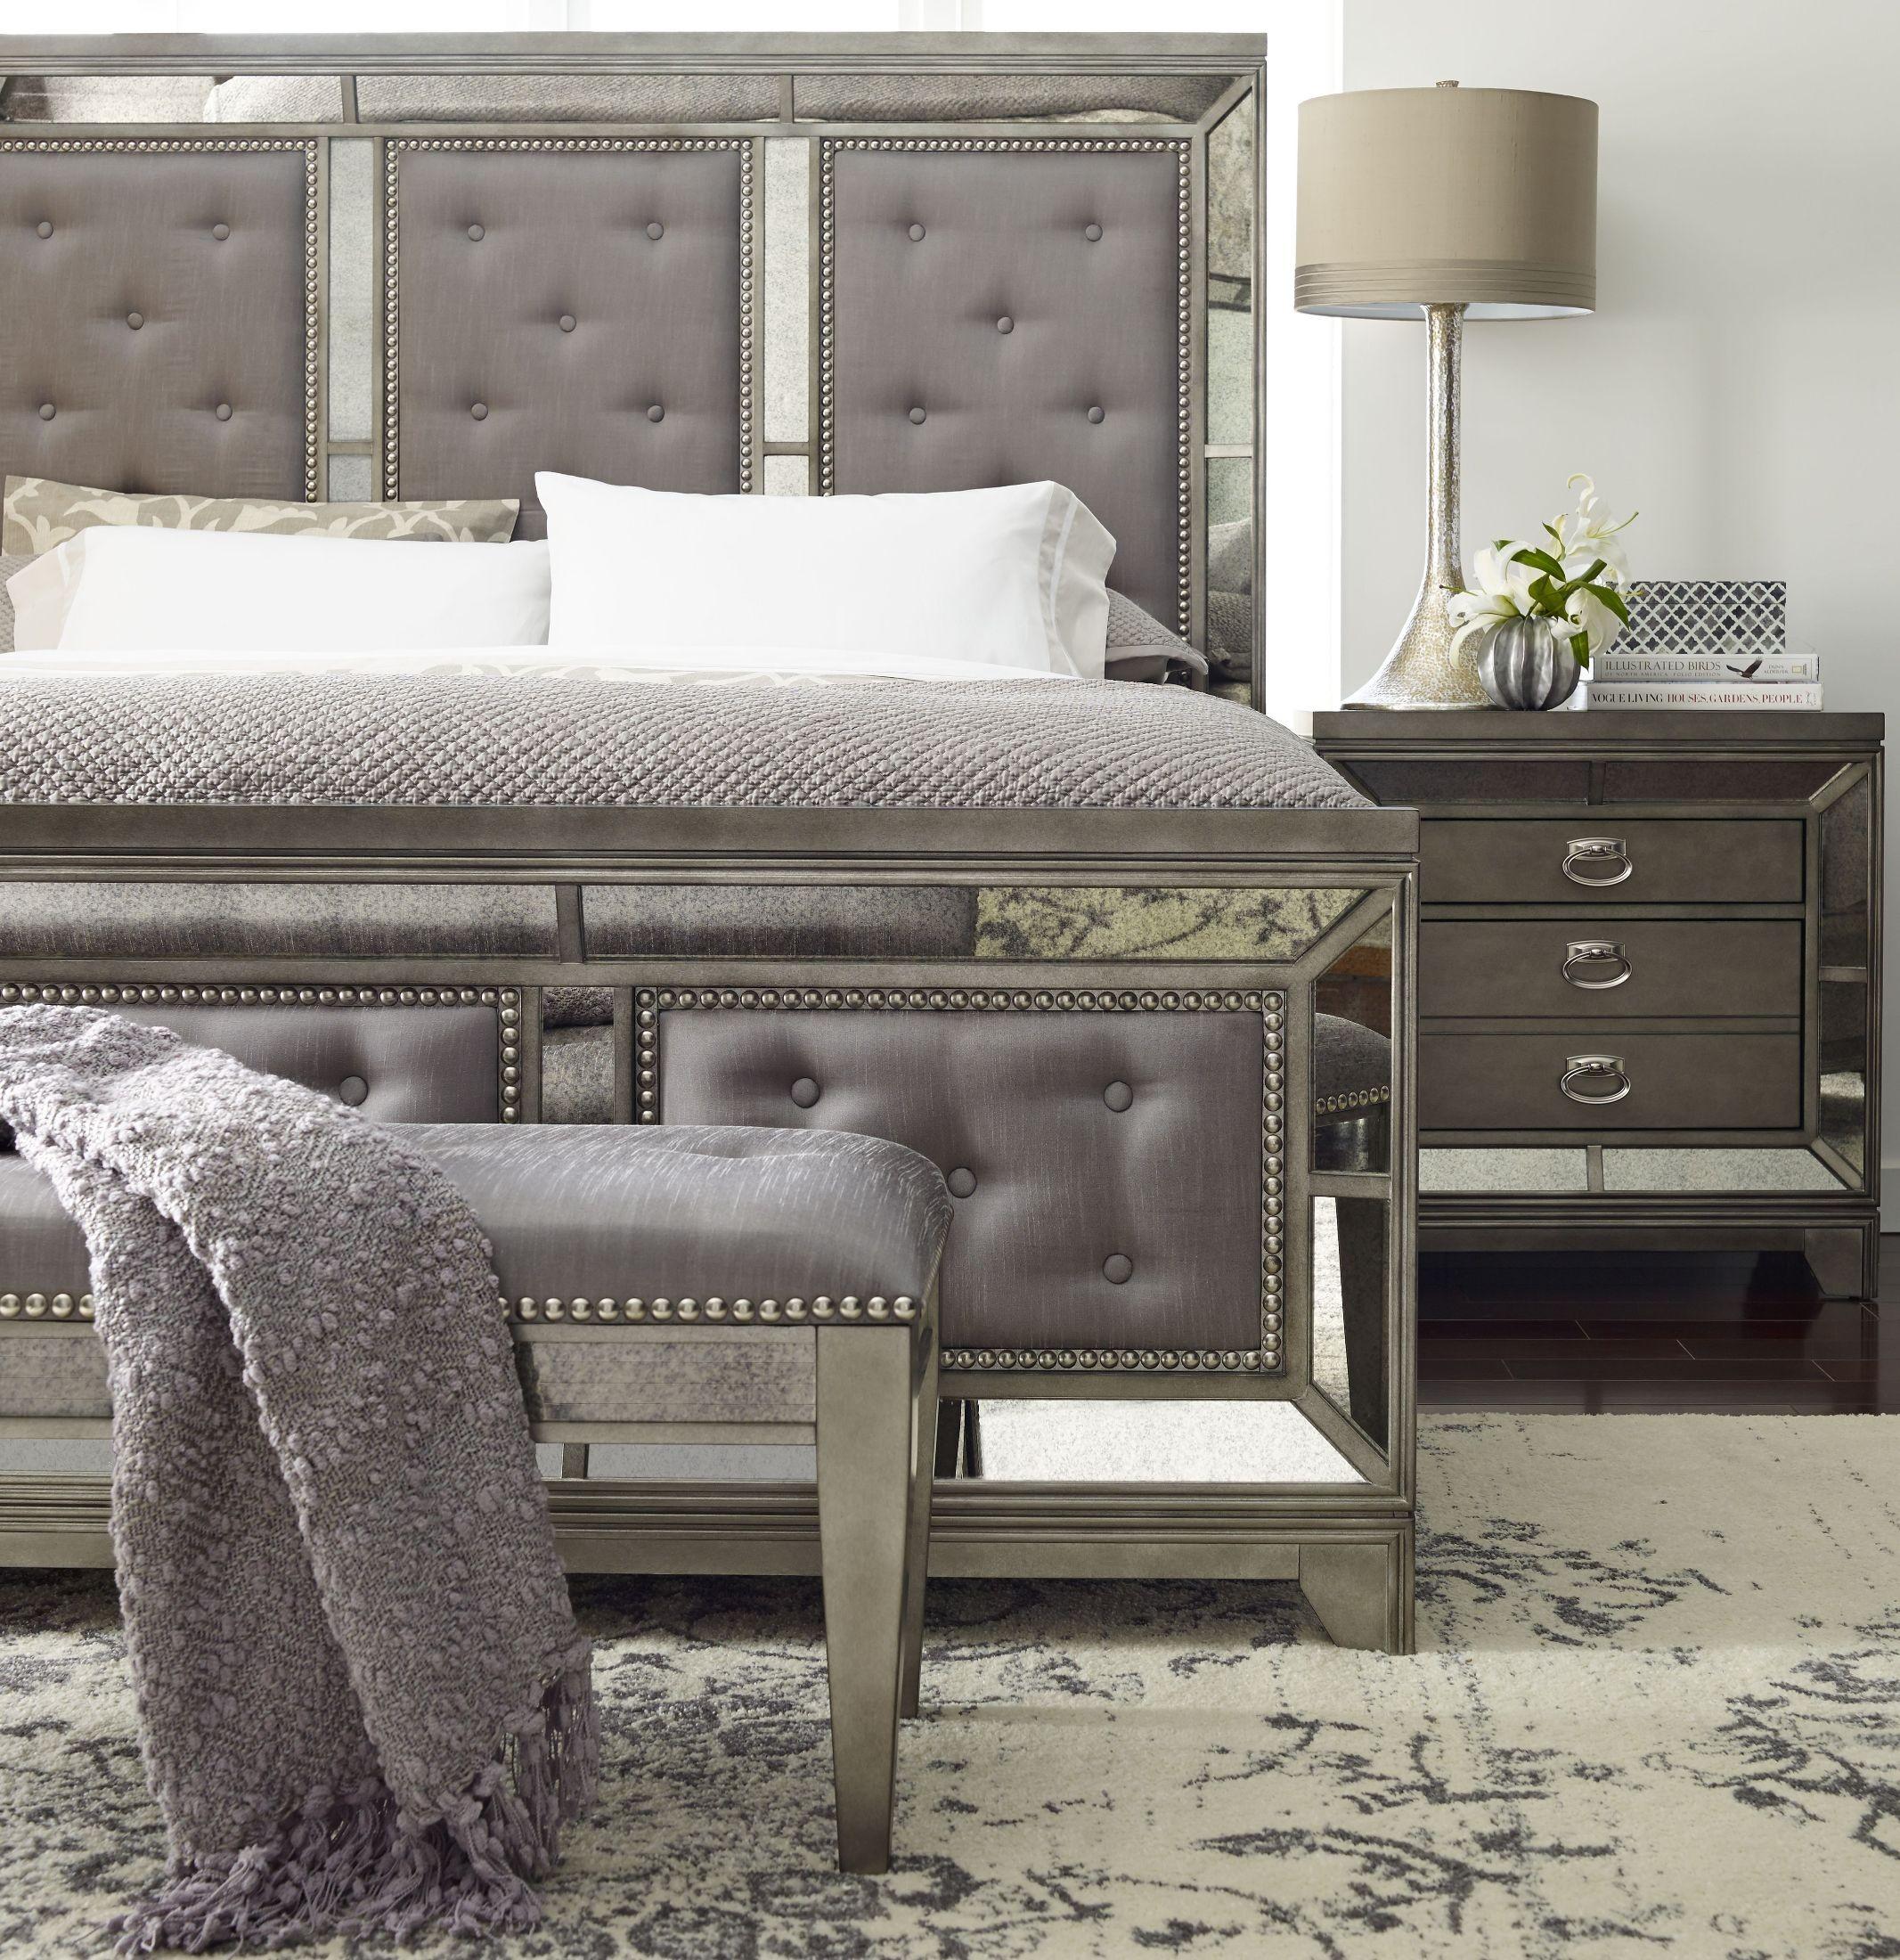 avalon bedroom set. Lenox Platinum Painted Upholstered Panel Bedroom Set from Avalon